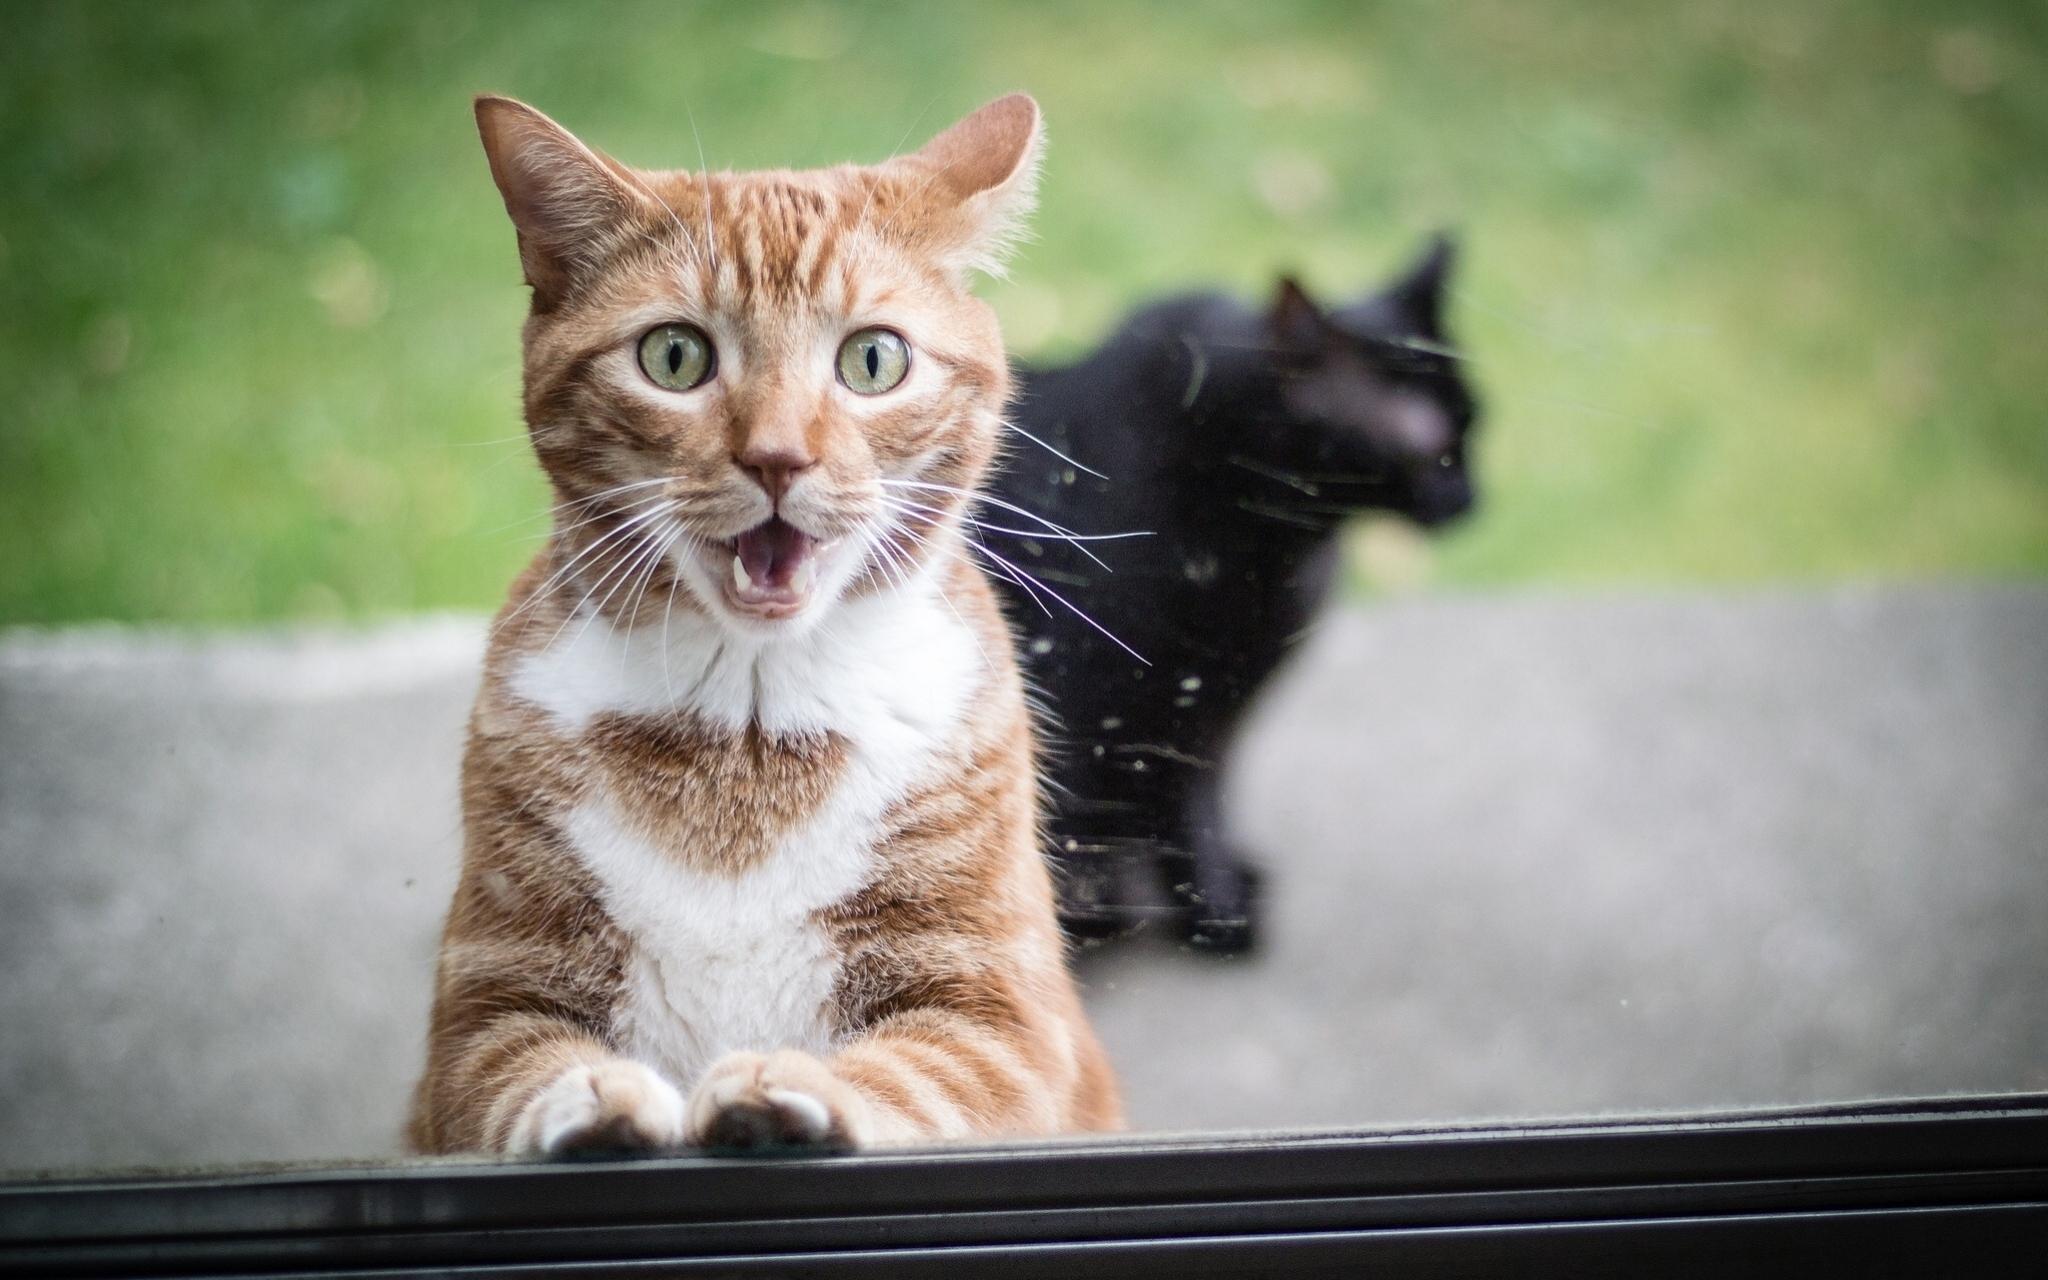 Animals___Cats__Surprised_red_cat_and_black_cat_044831_